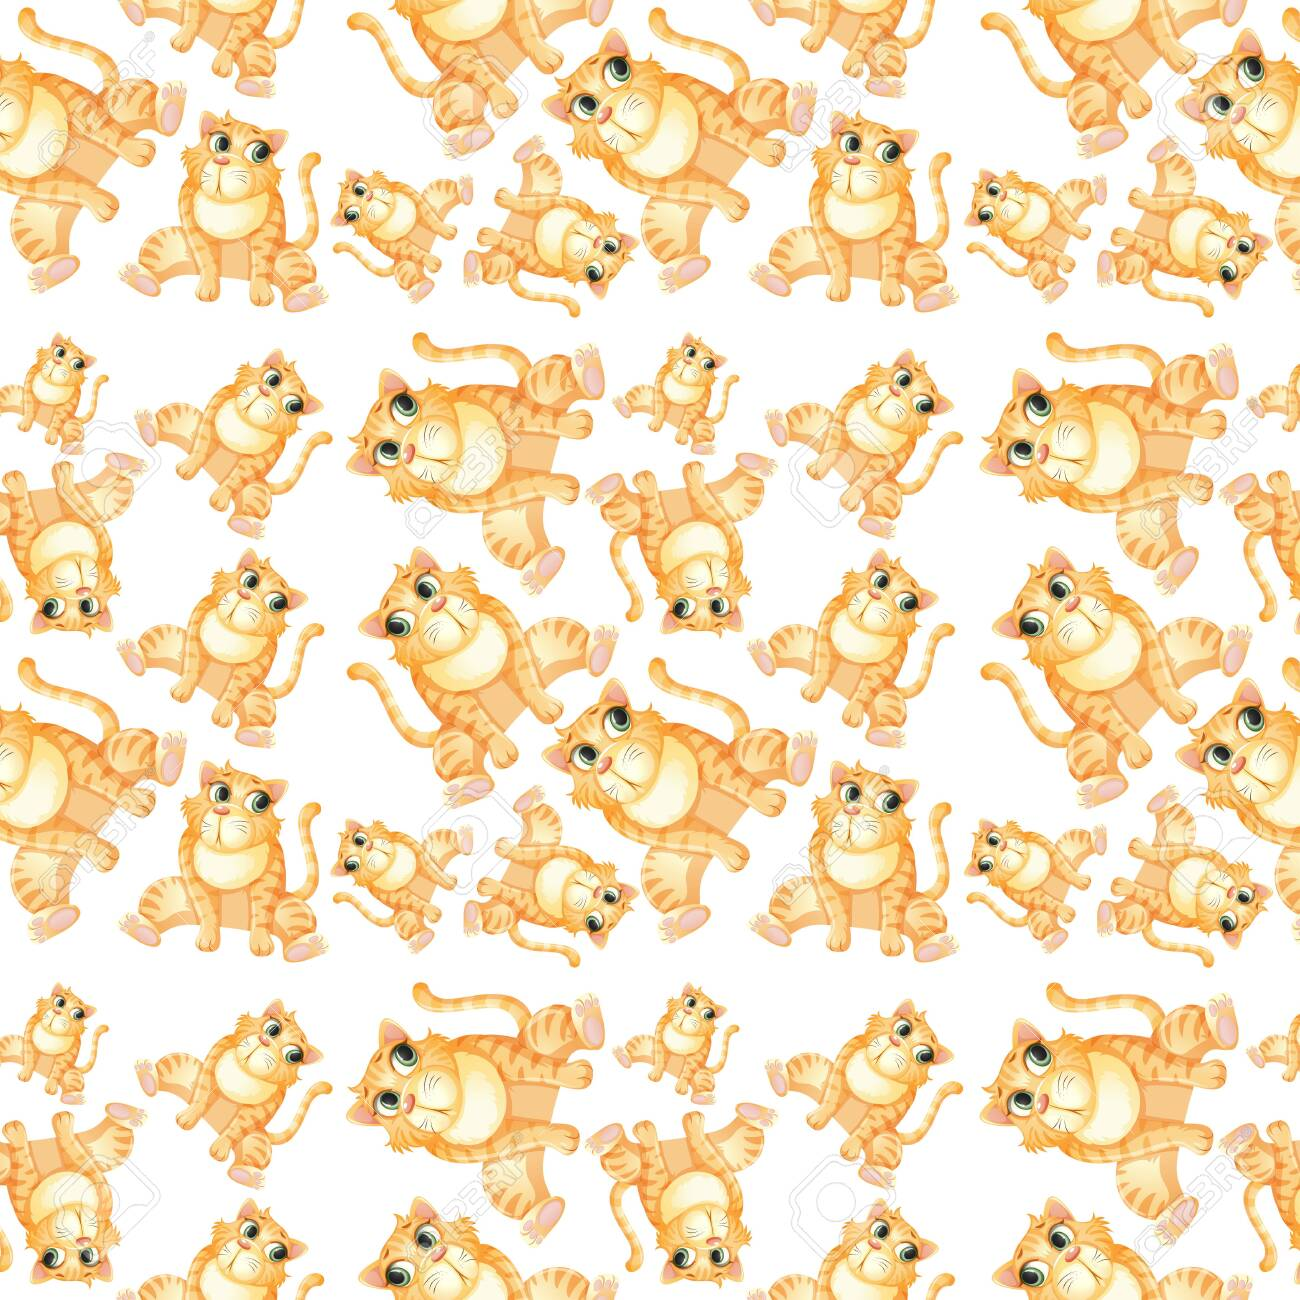 Yellow cat seamless pattern illustration - 121751082